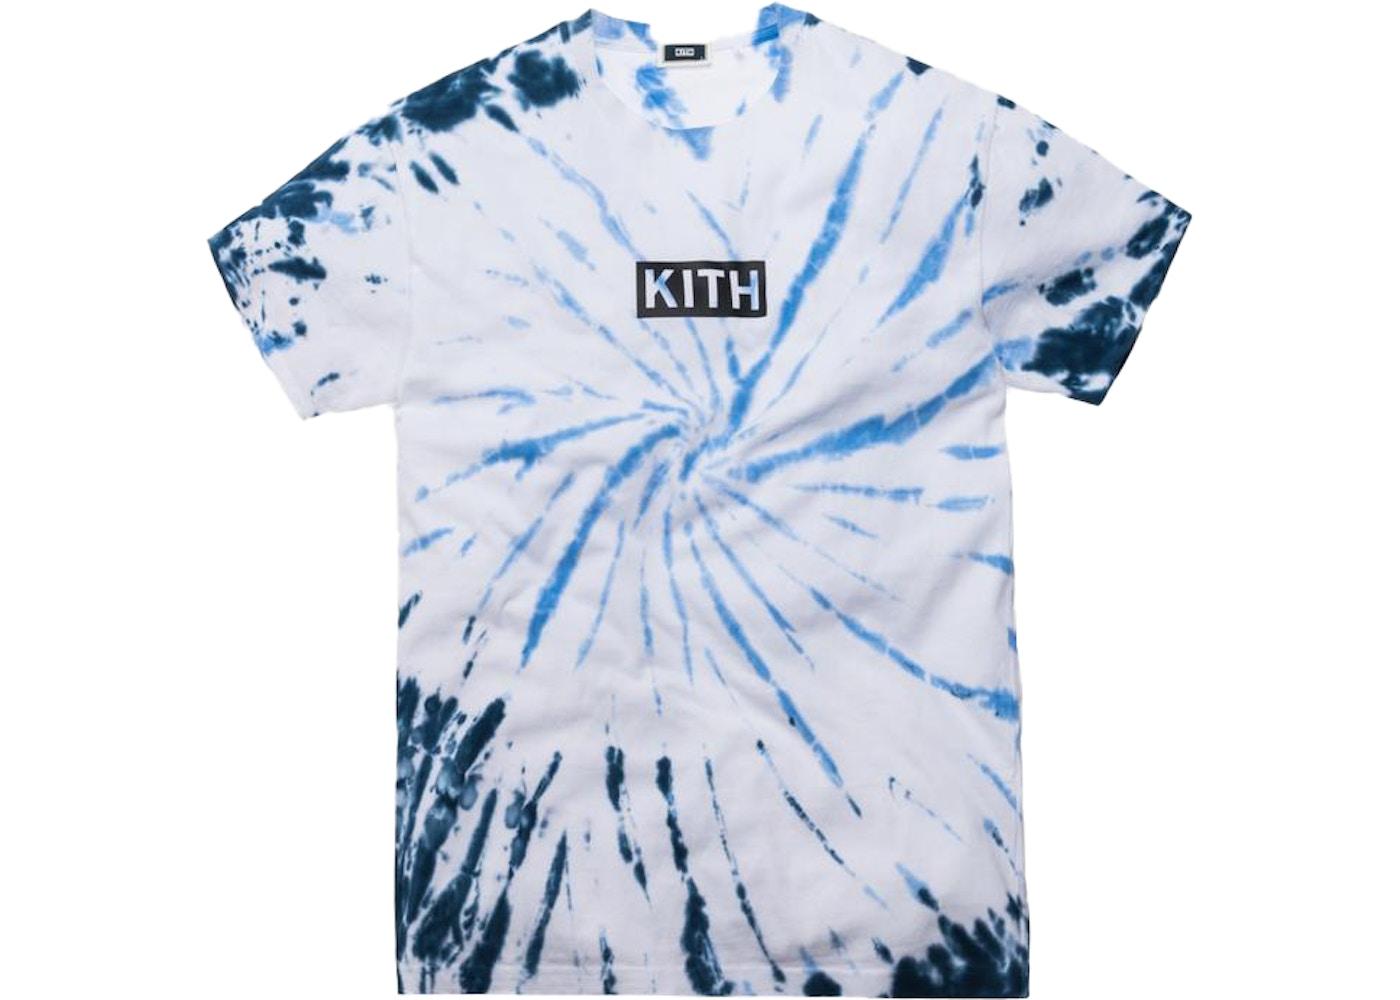 09d8889a Kith Summer Tie Dye Tee Blue/White - SS19